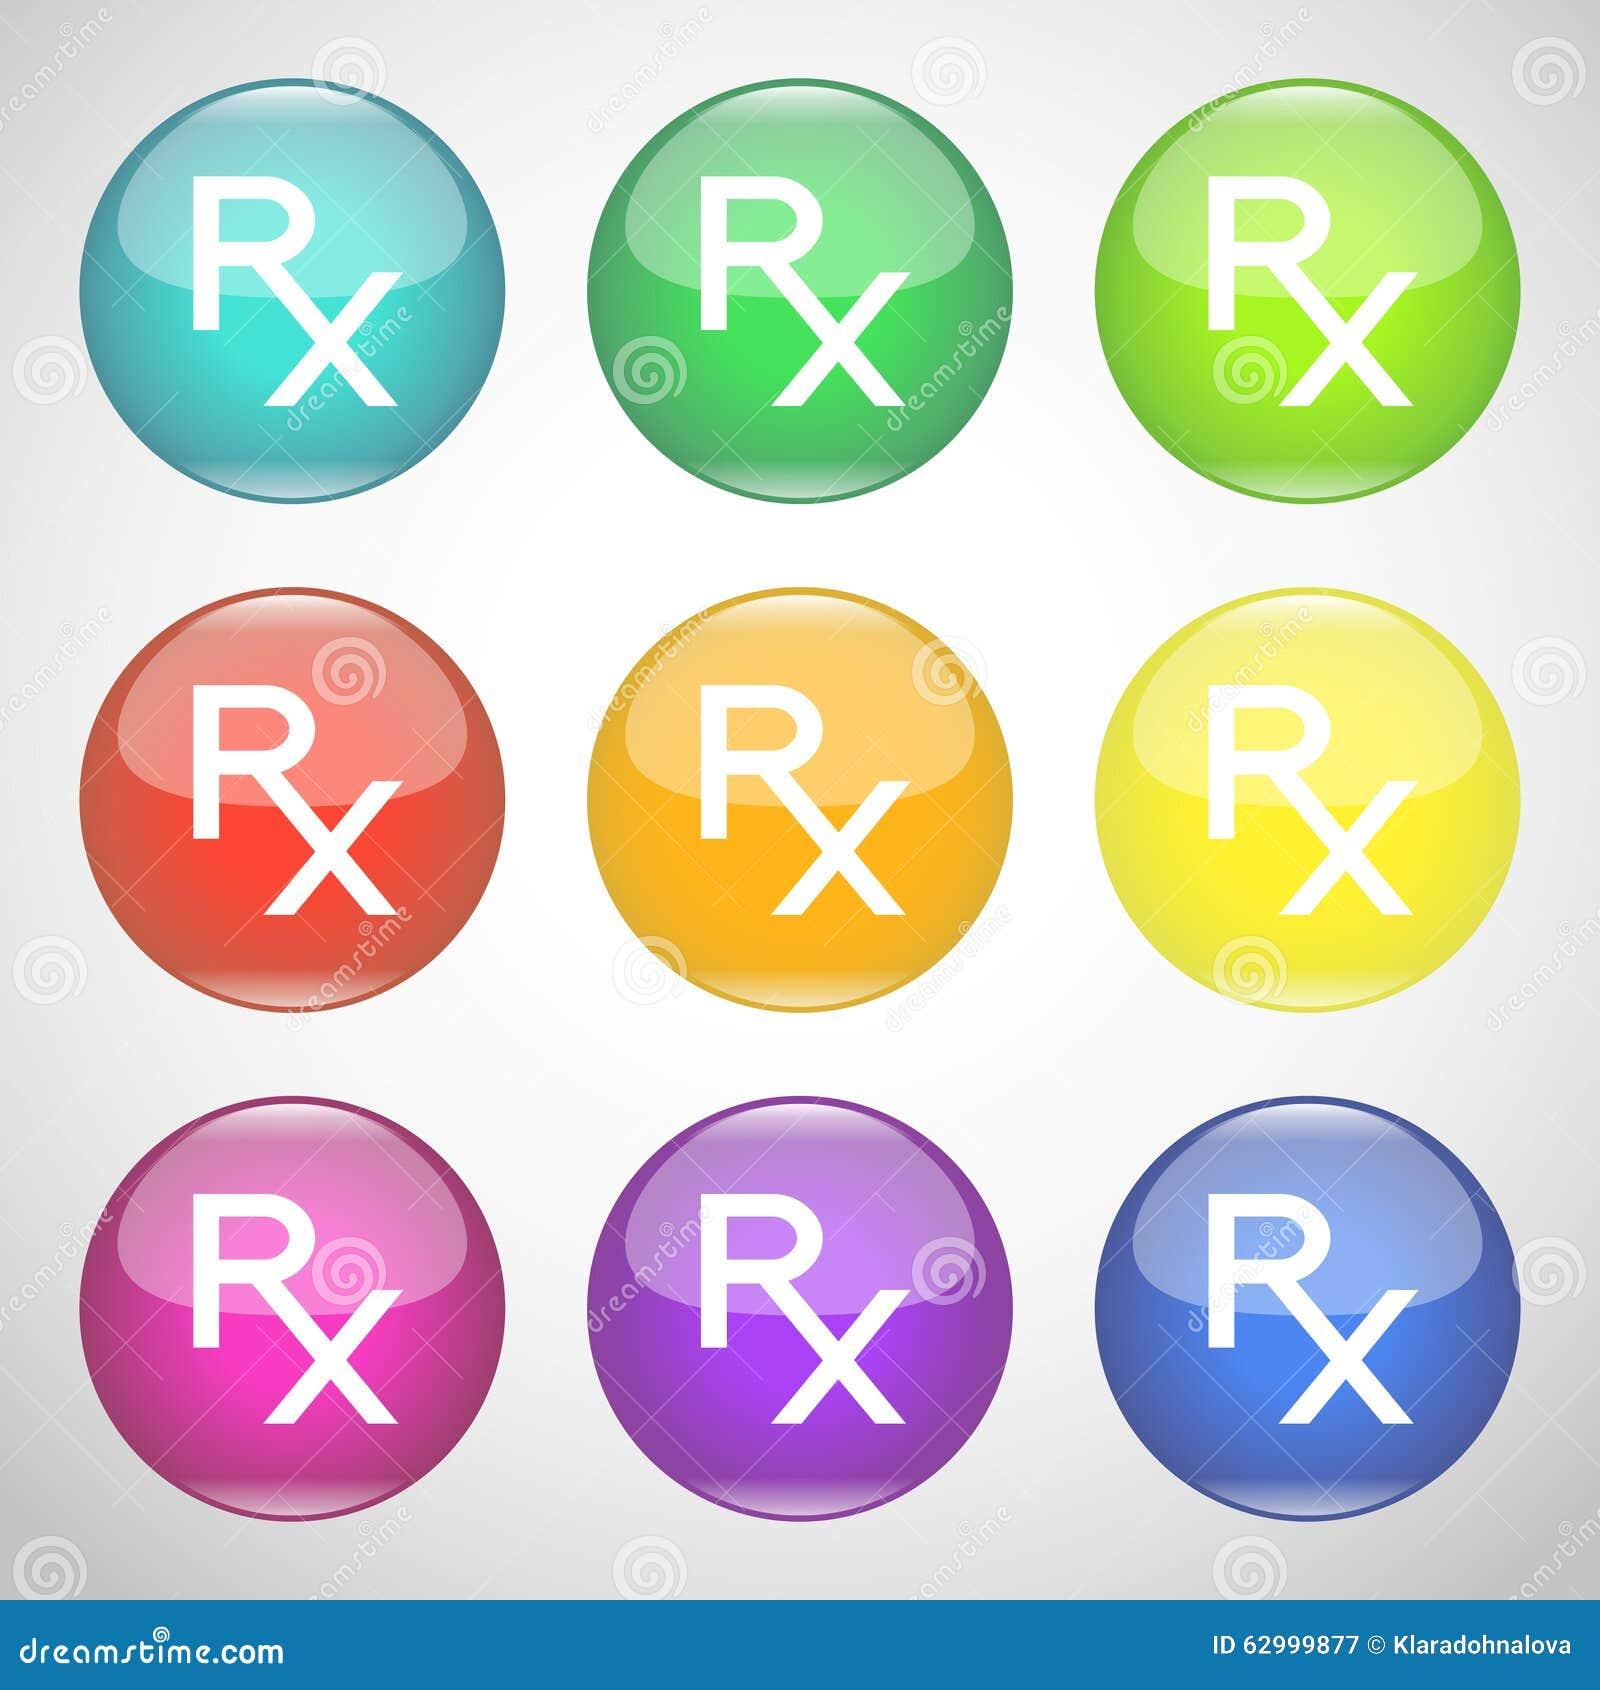 Shiny Rx Buttons Colorful Set Of Symbols Of Prescription Medicine